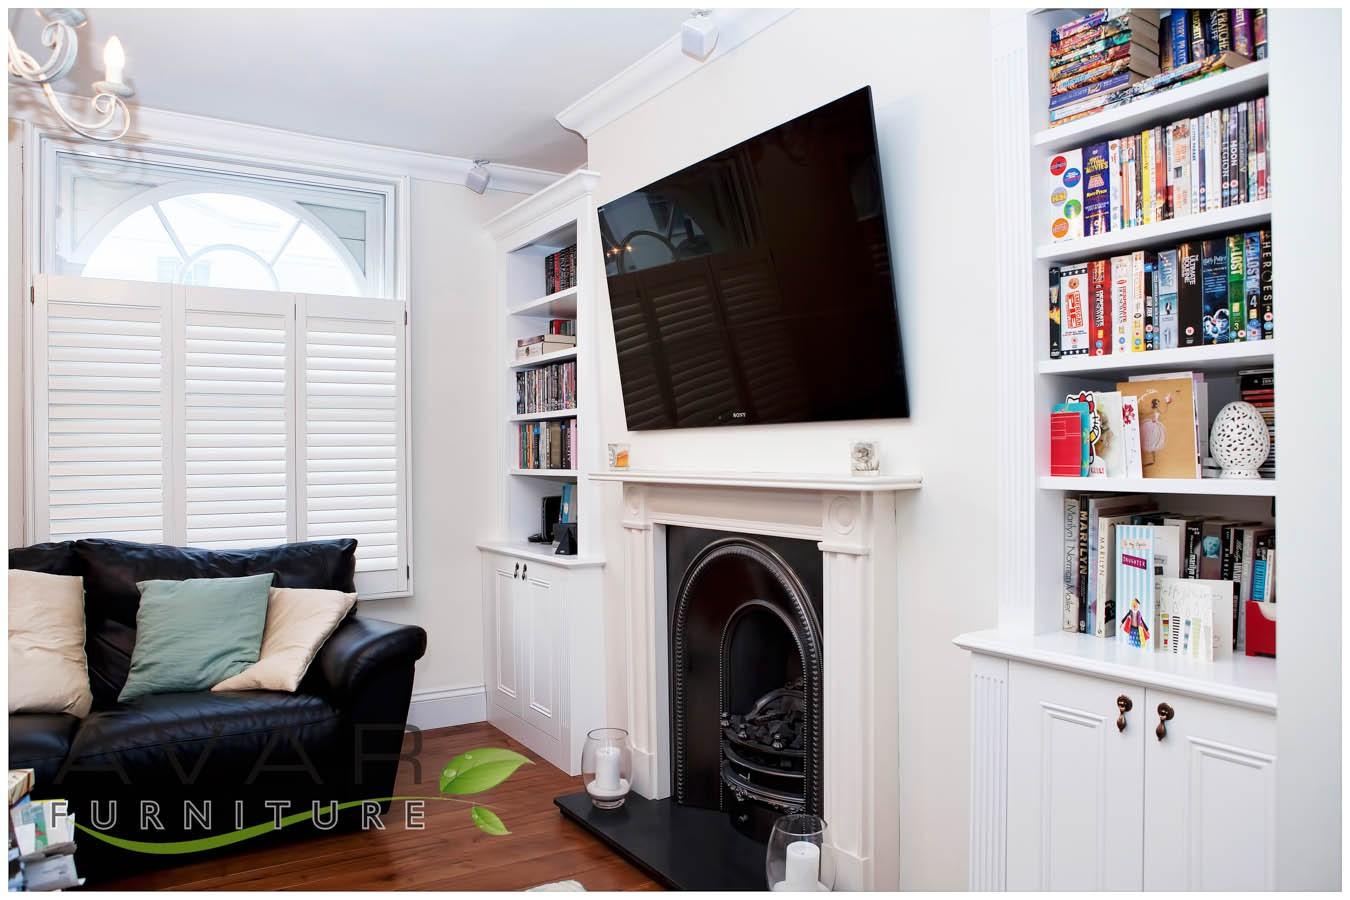 alcove units ideas gallery 8 north london uk. Black Bedroom Furniture Sets. Home Design Ideas